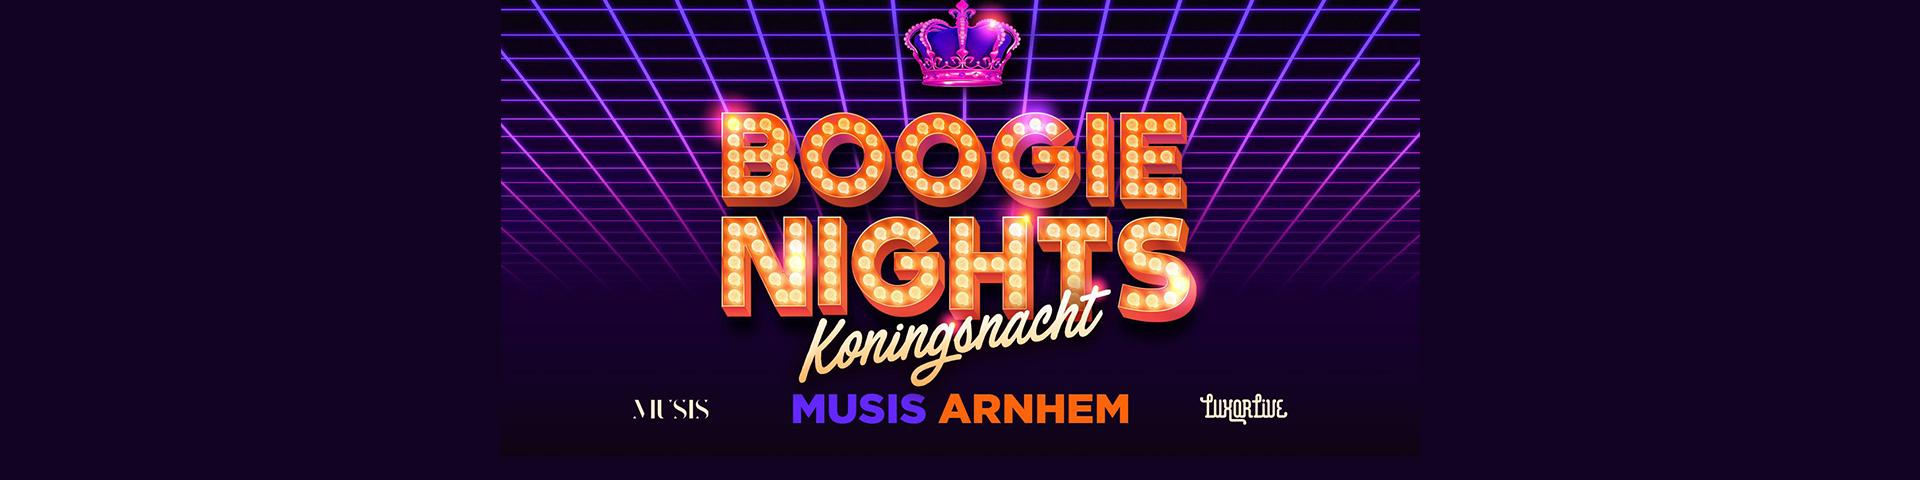 Boogie Nights Koningsnacht in Musis Arnhem